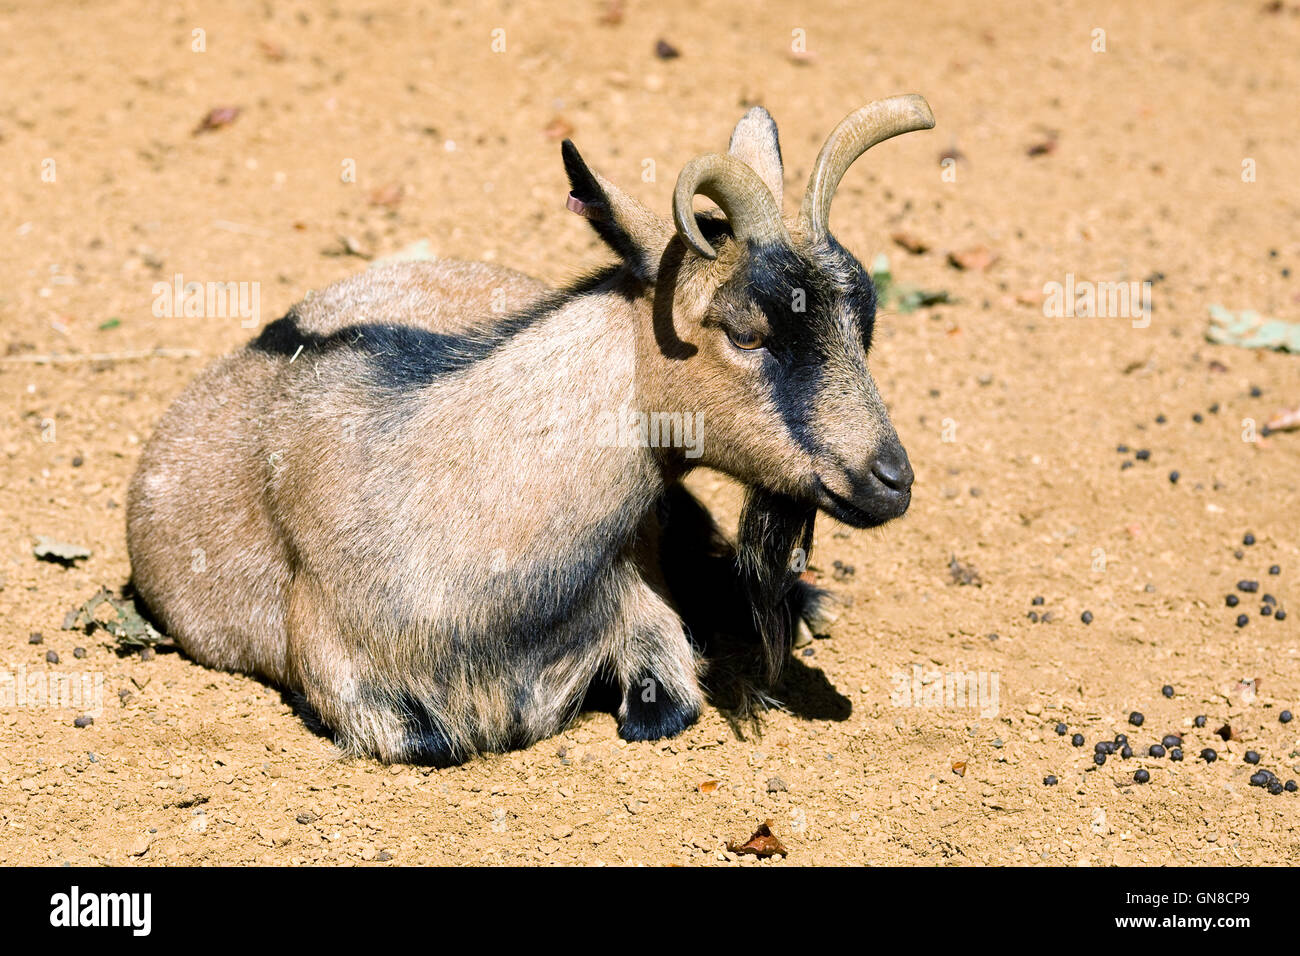 Capra hircus. African pygmy goat. - Stock Image